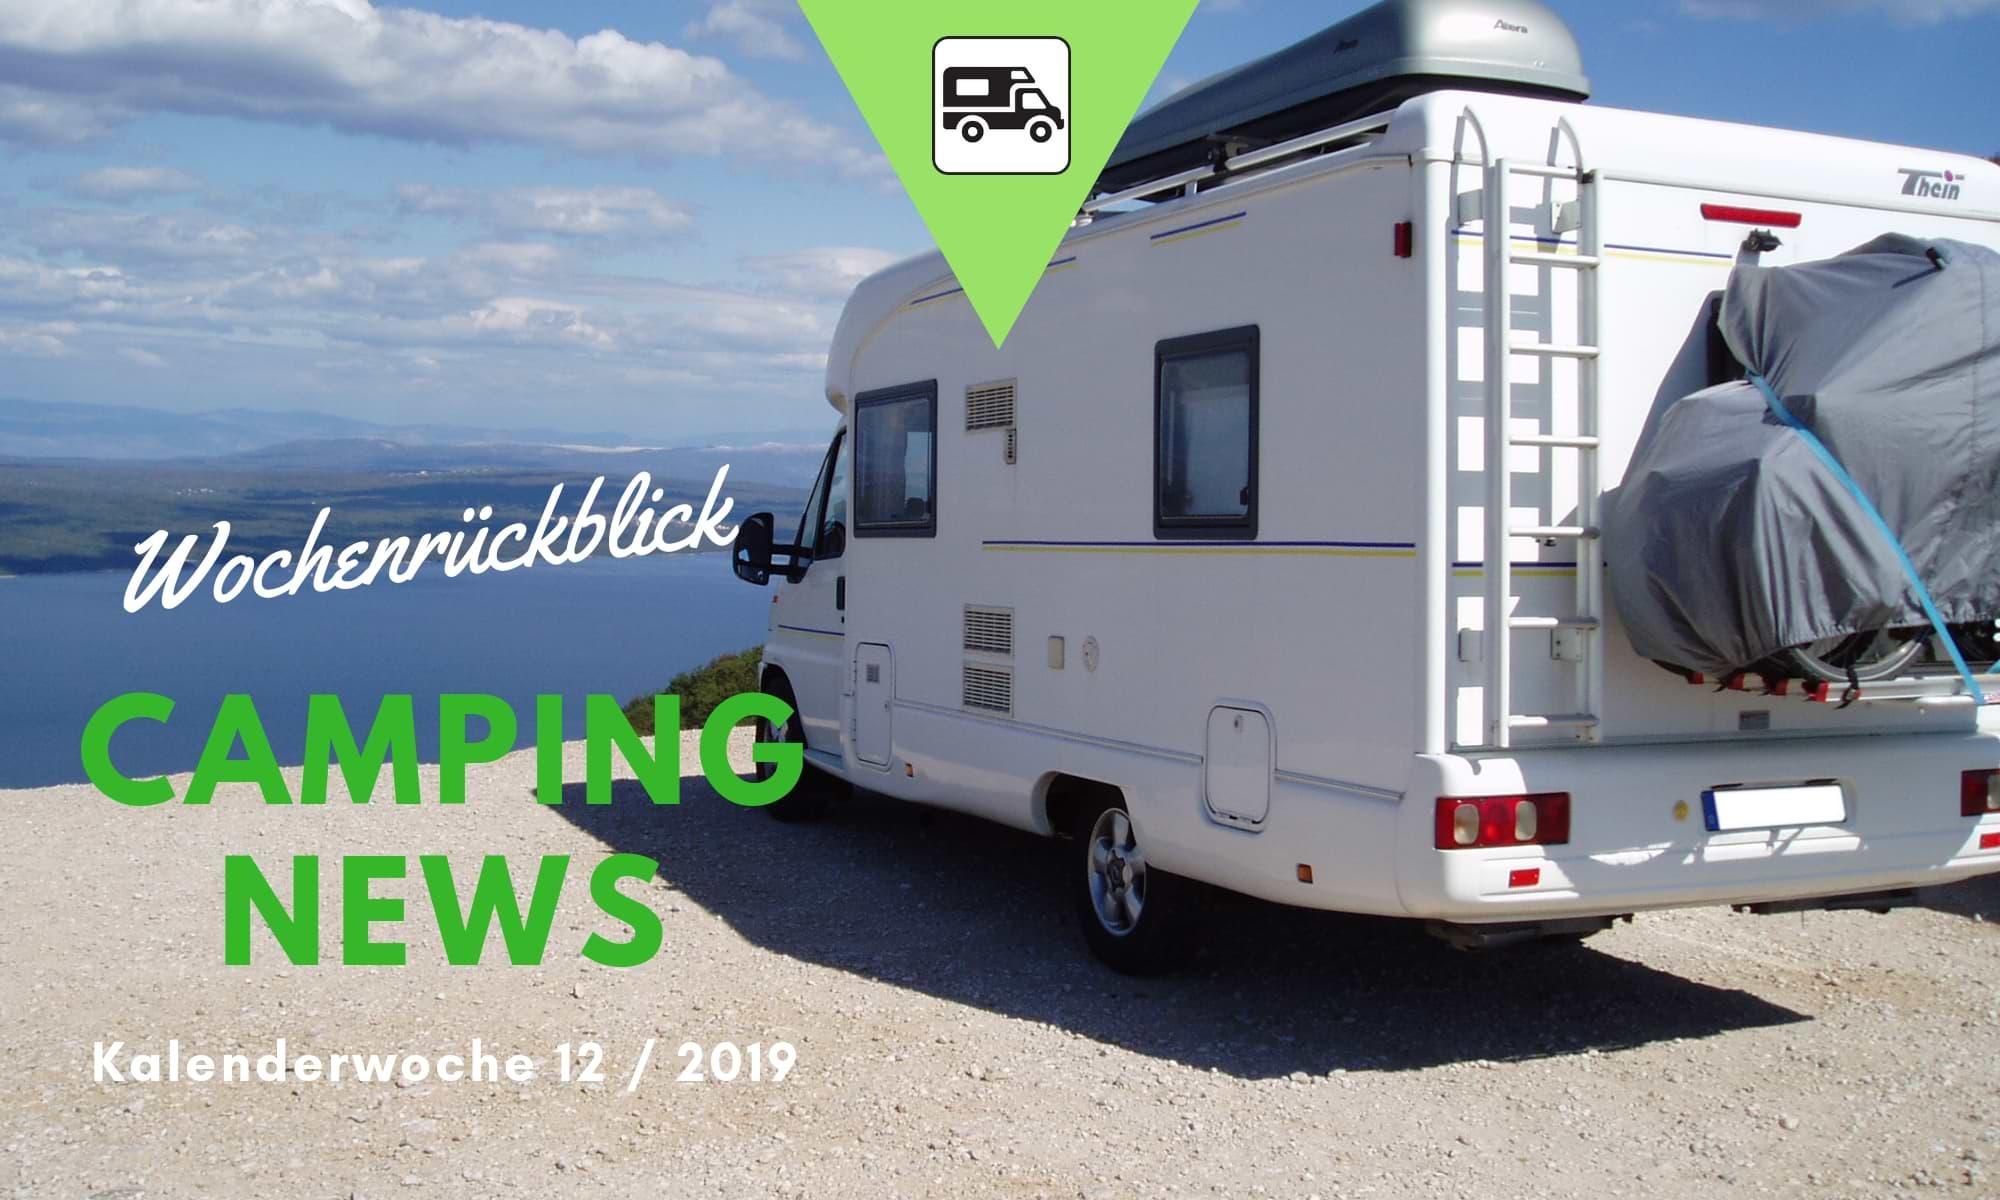 Wochenrückblick Camping News KW12-2019